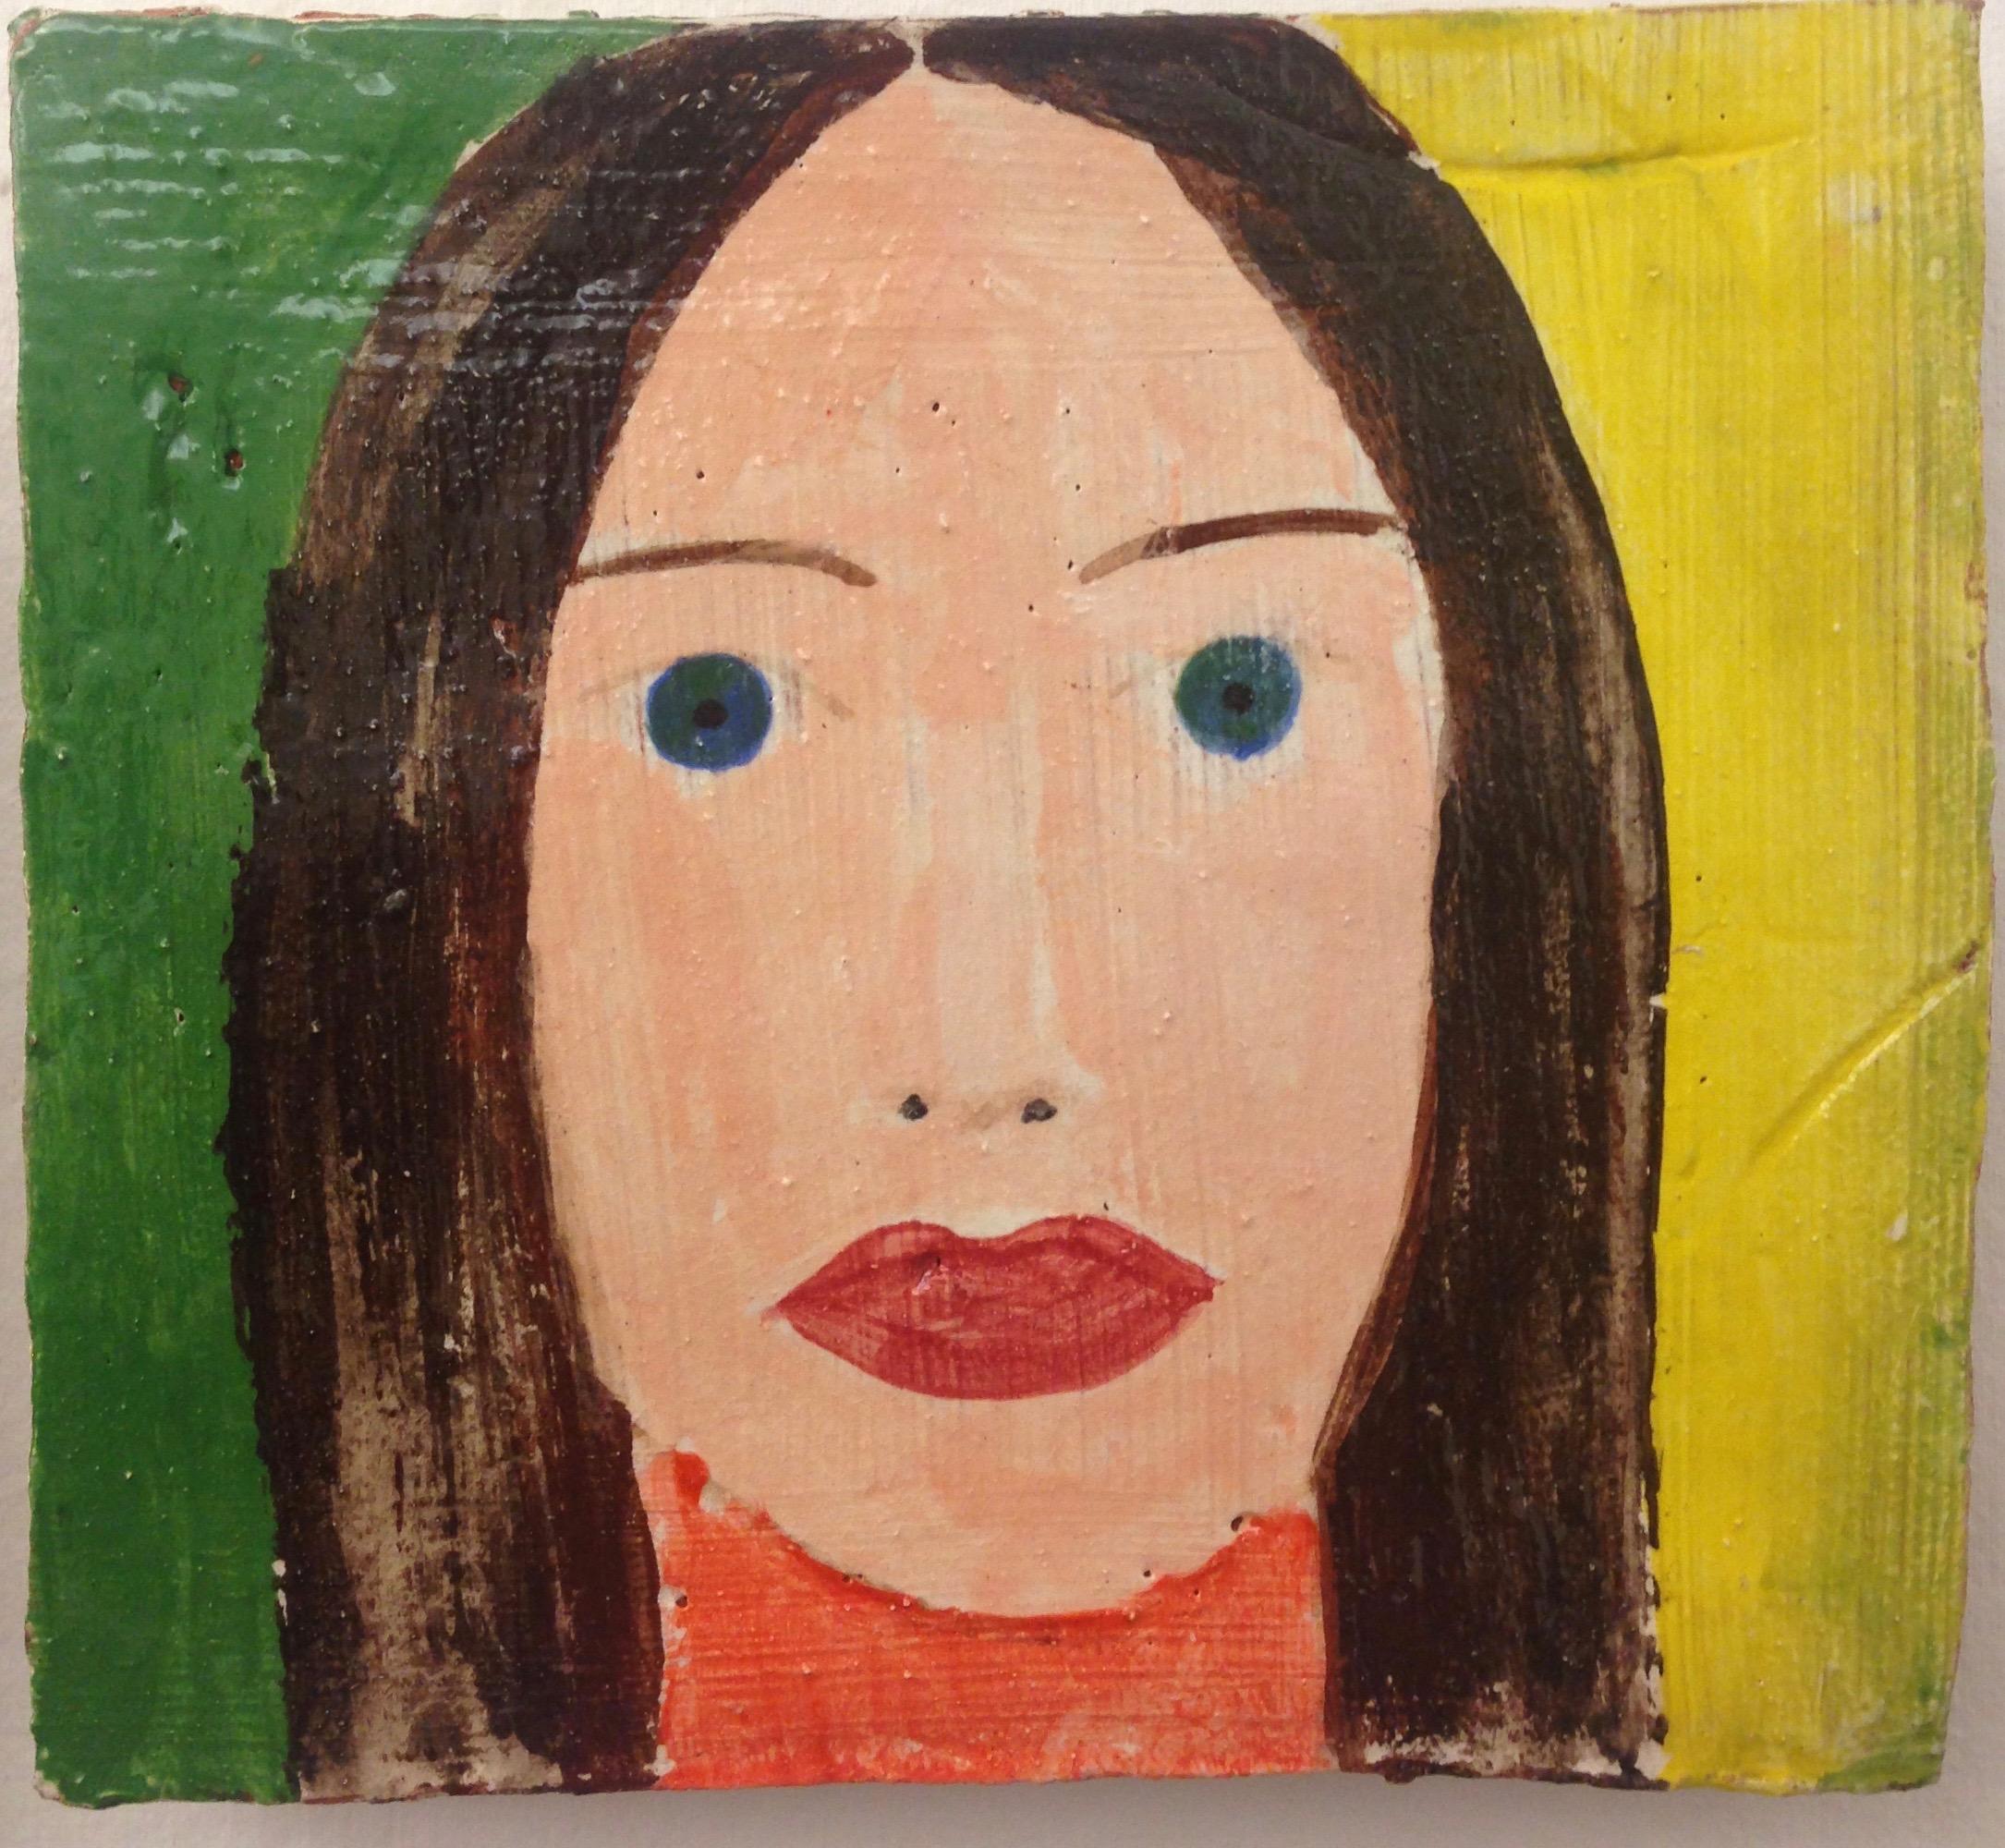 Portrait of Ariadna after Alex Katz, 2015